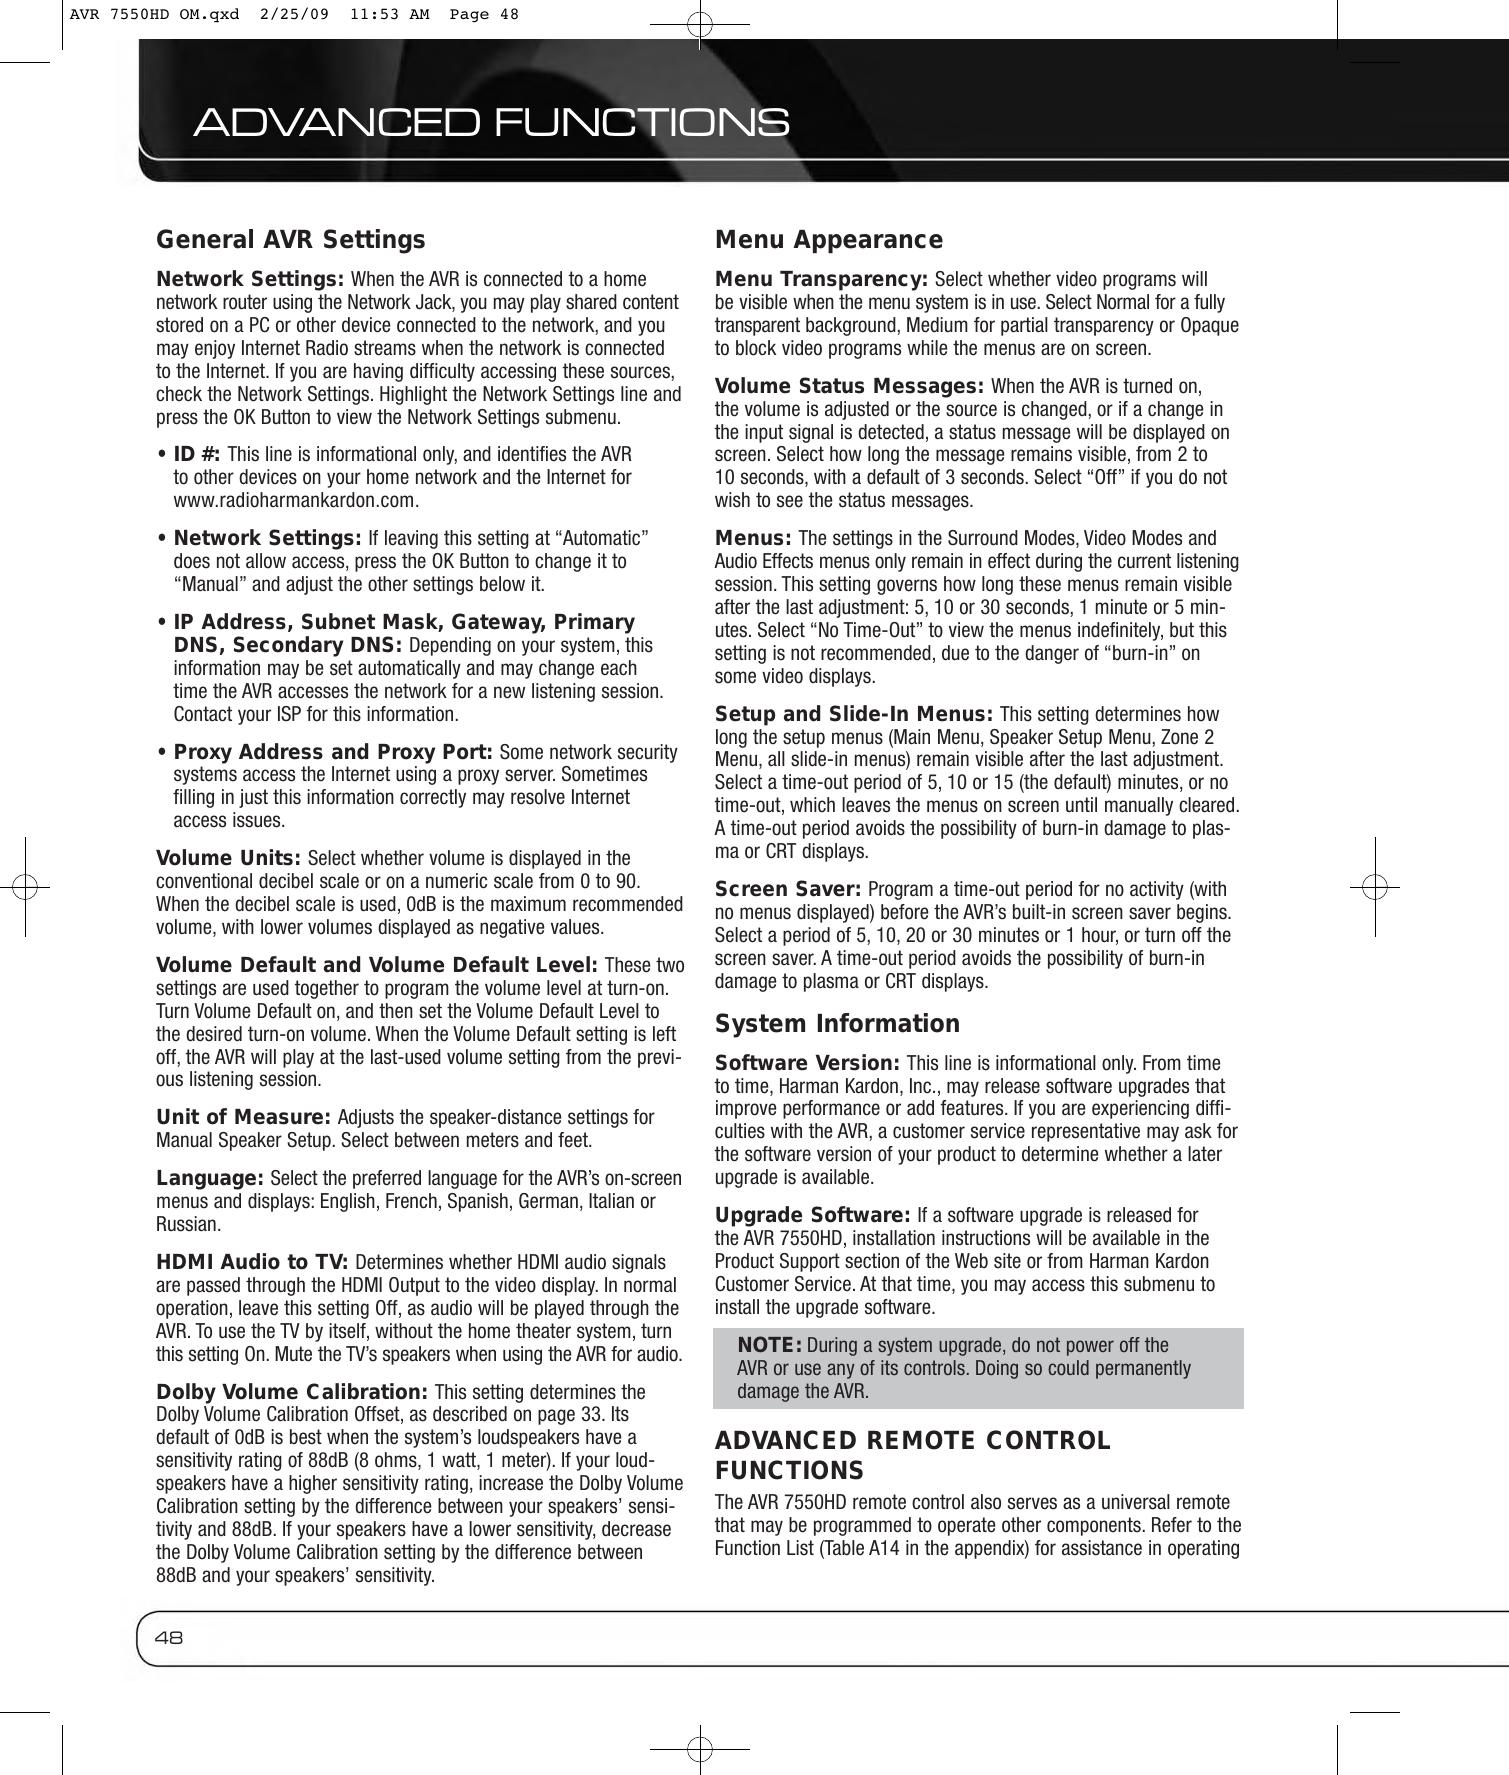 Harman Kardon Avr 7550Hd Users Manual AVR7550HD